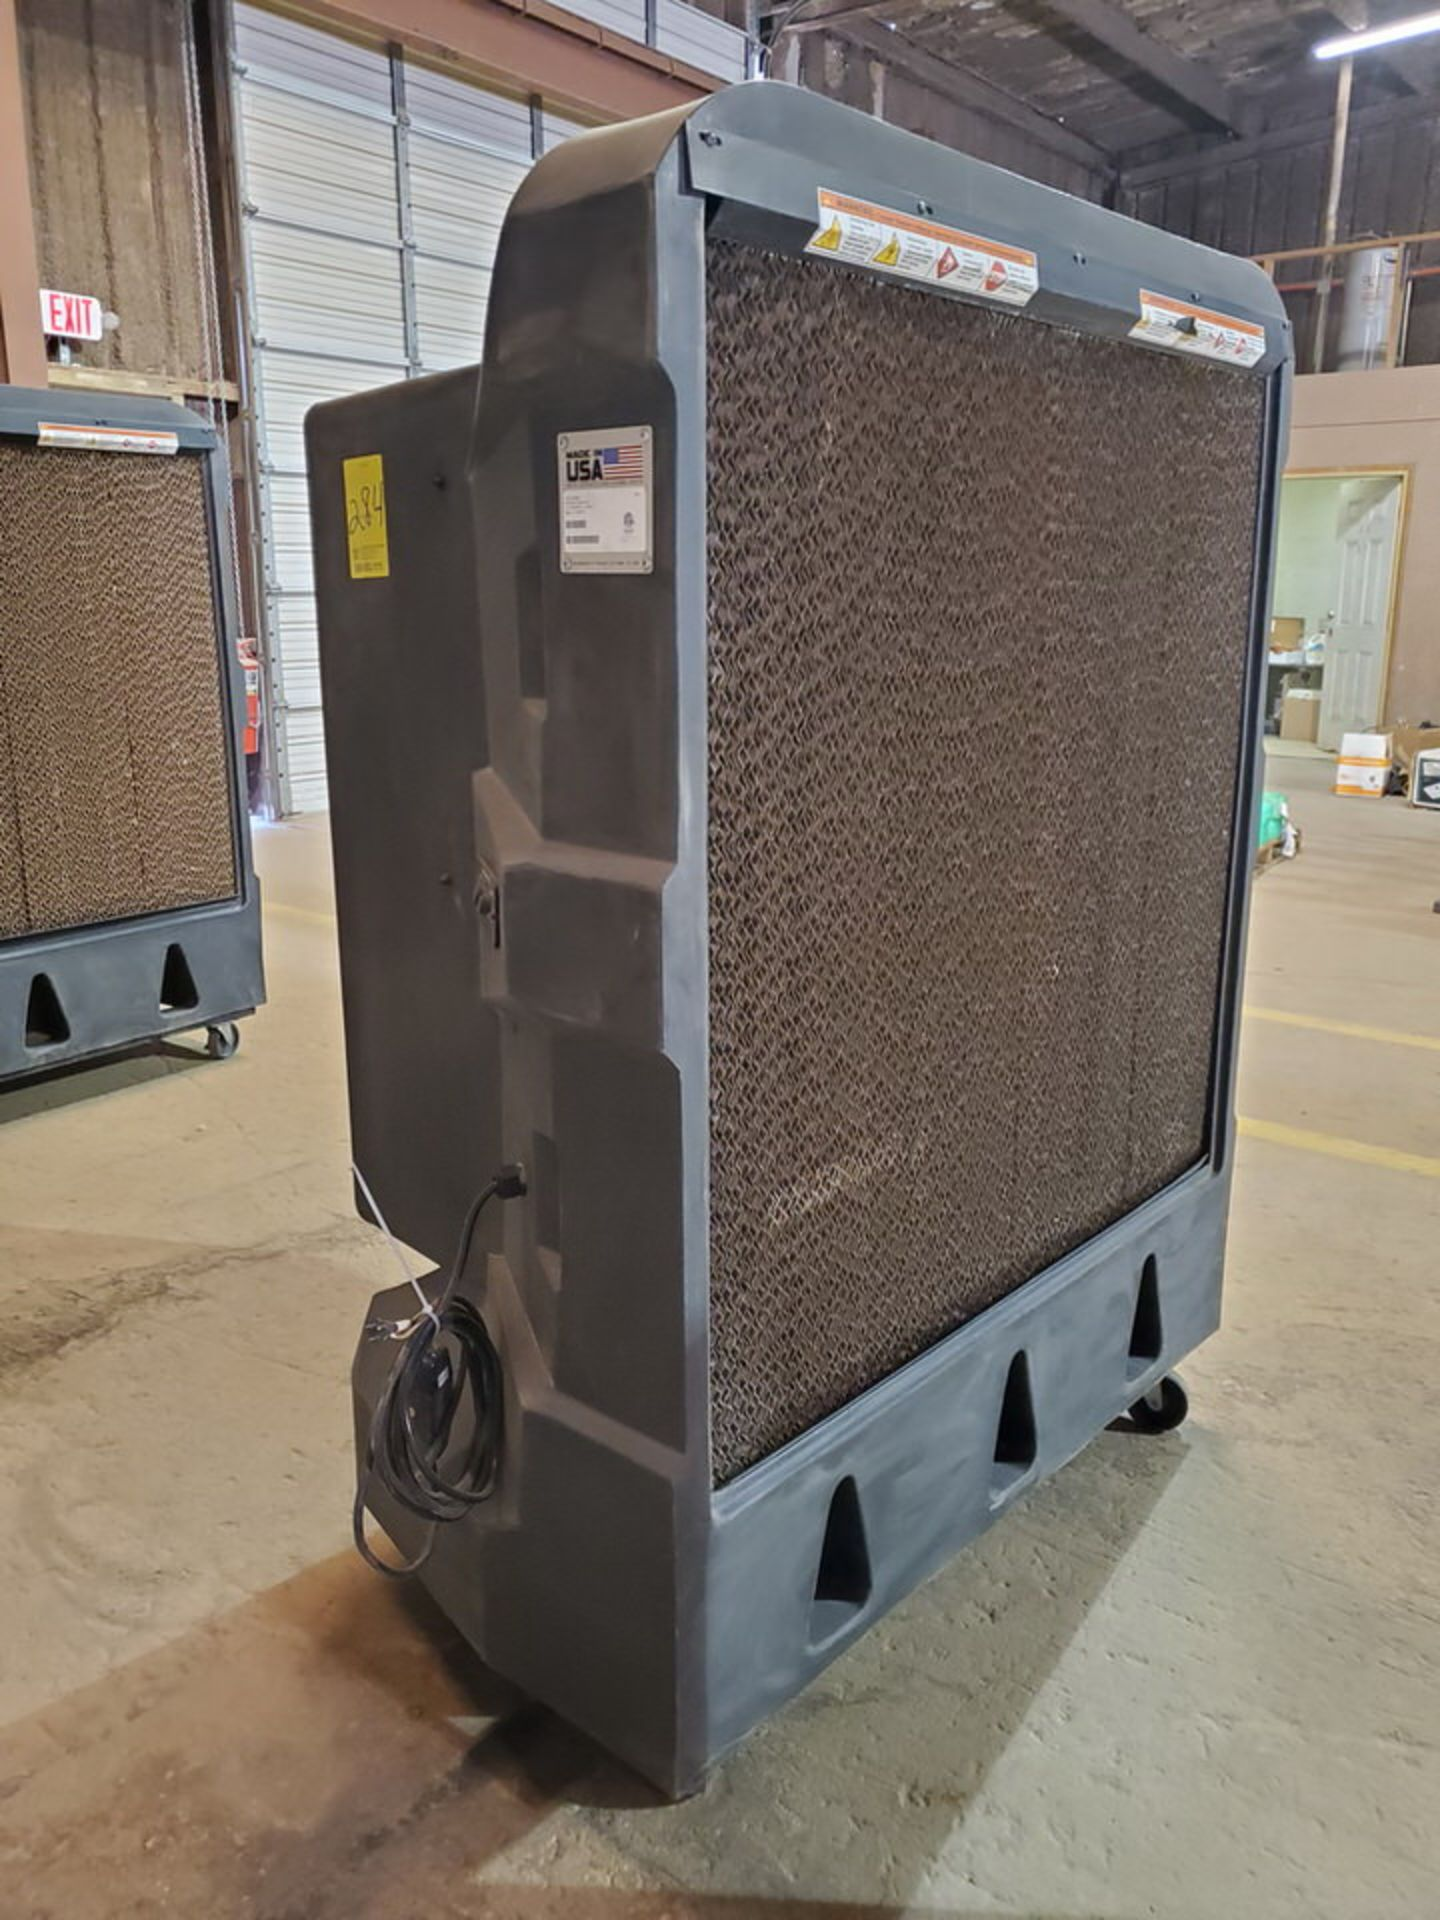 Portacool Cyclone 160 Portable Evaporative Cooler 115V, 60HZ, 7.3A